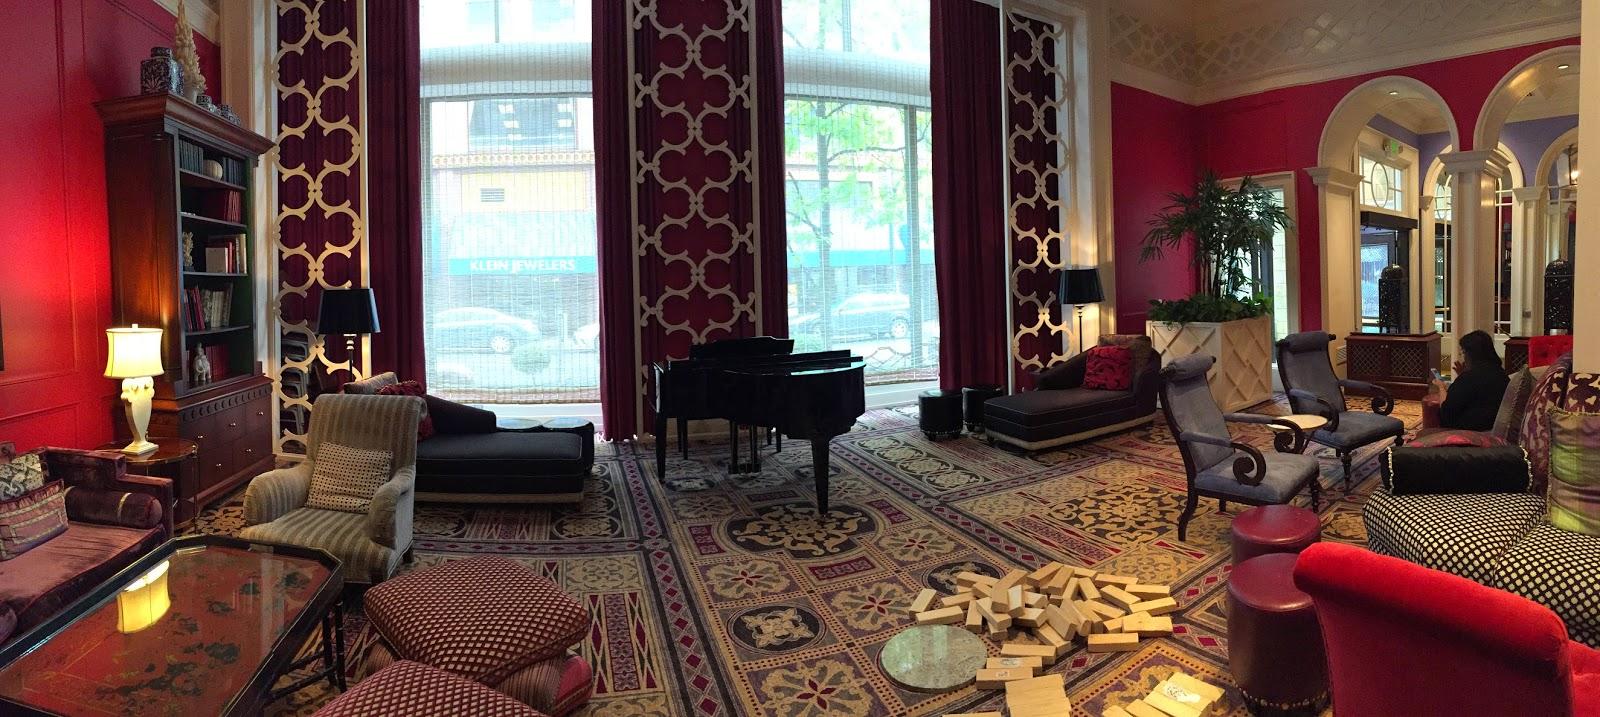 hotel-monaco-portland-review